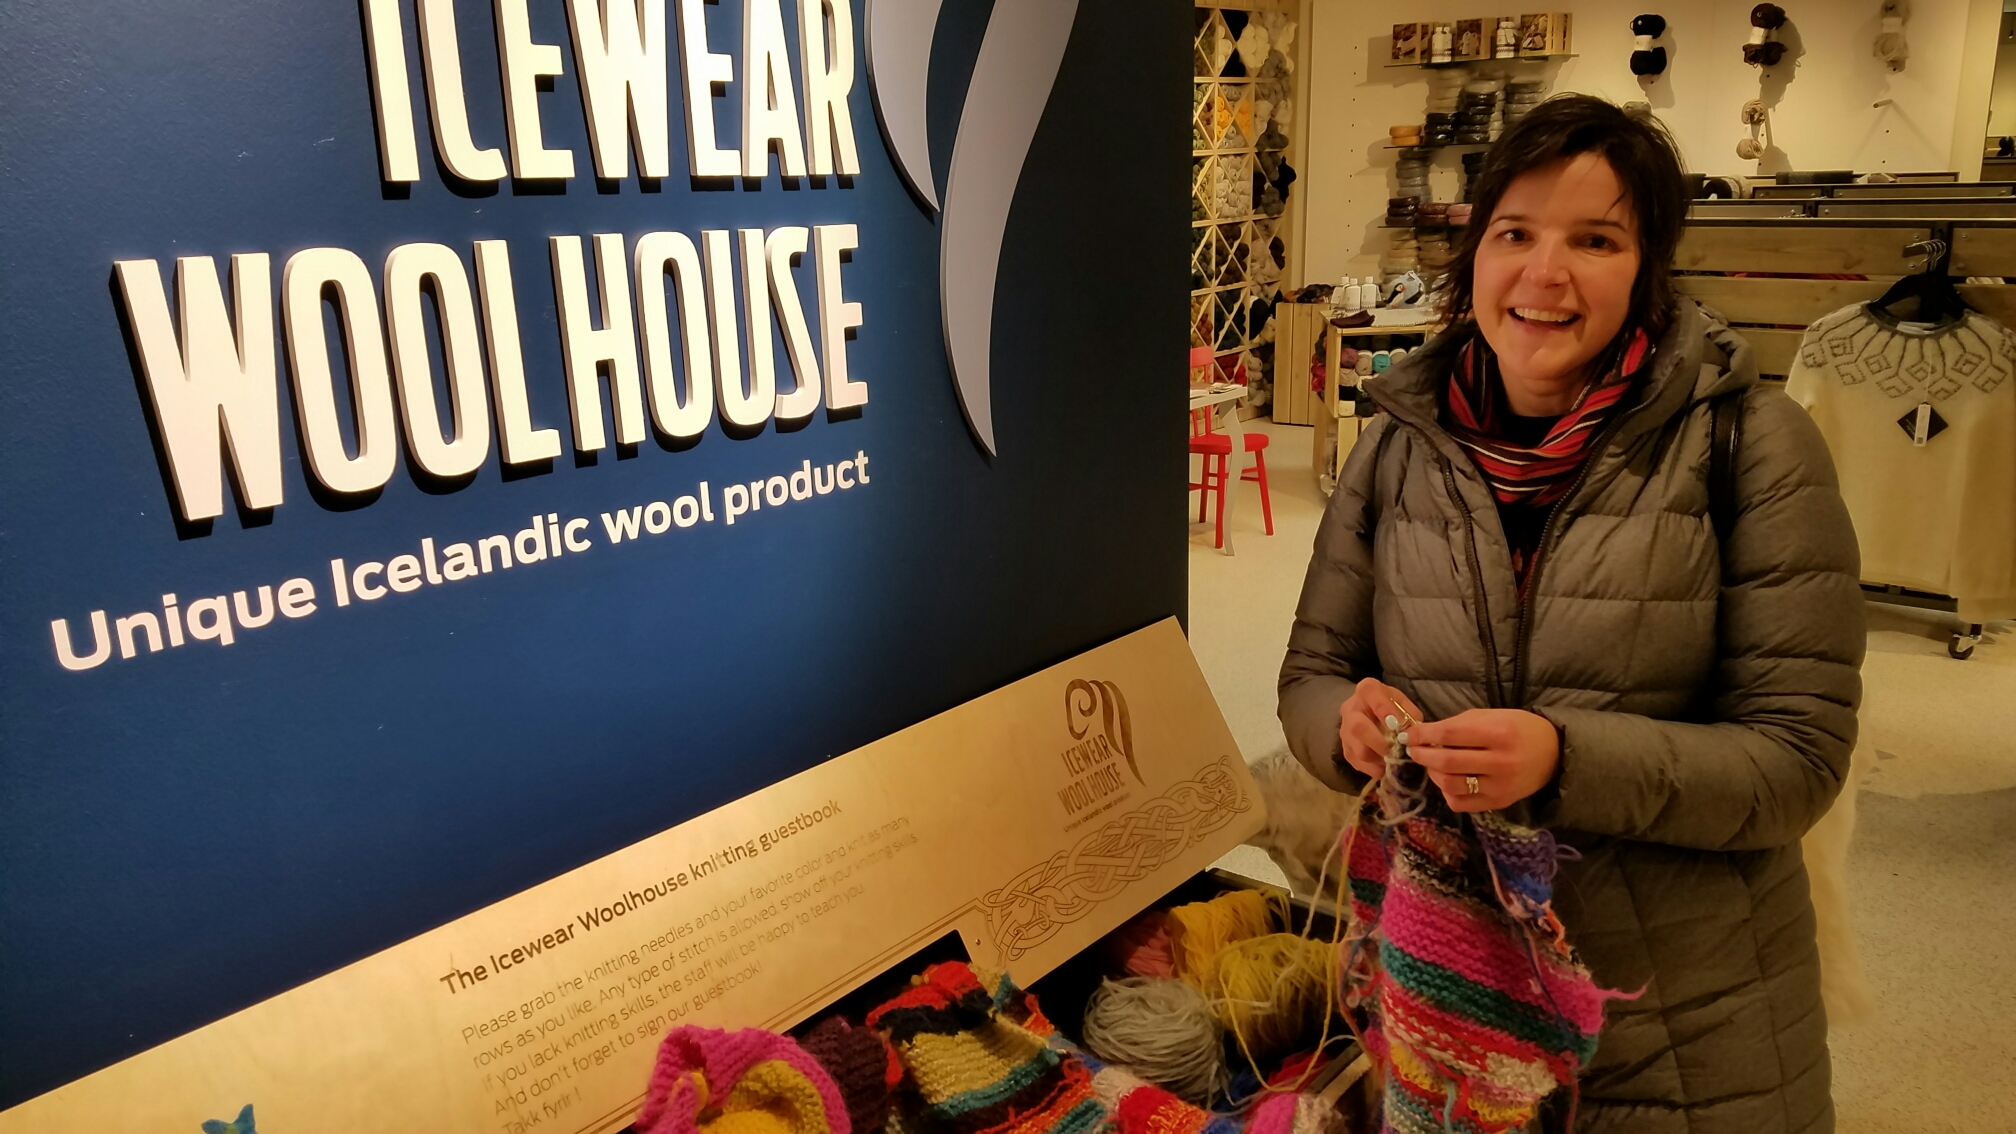 BJ Knapp author of Beside the Music knitting at Ice Wear Reykjavik Iceland